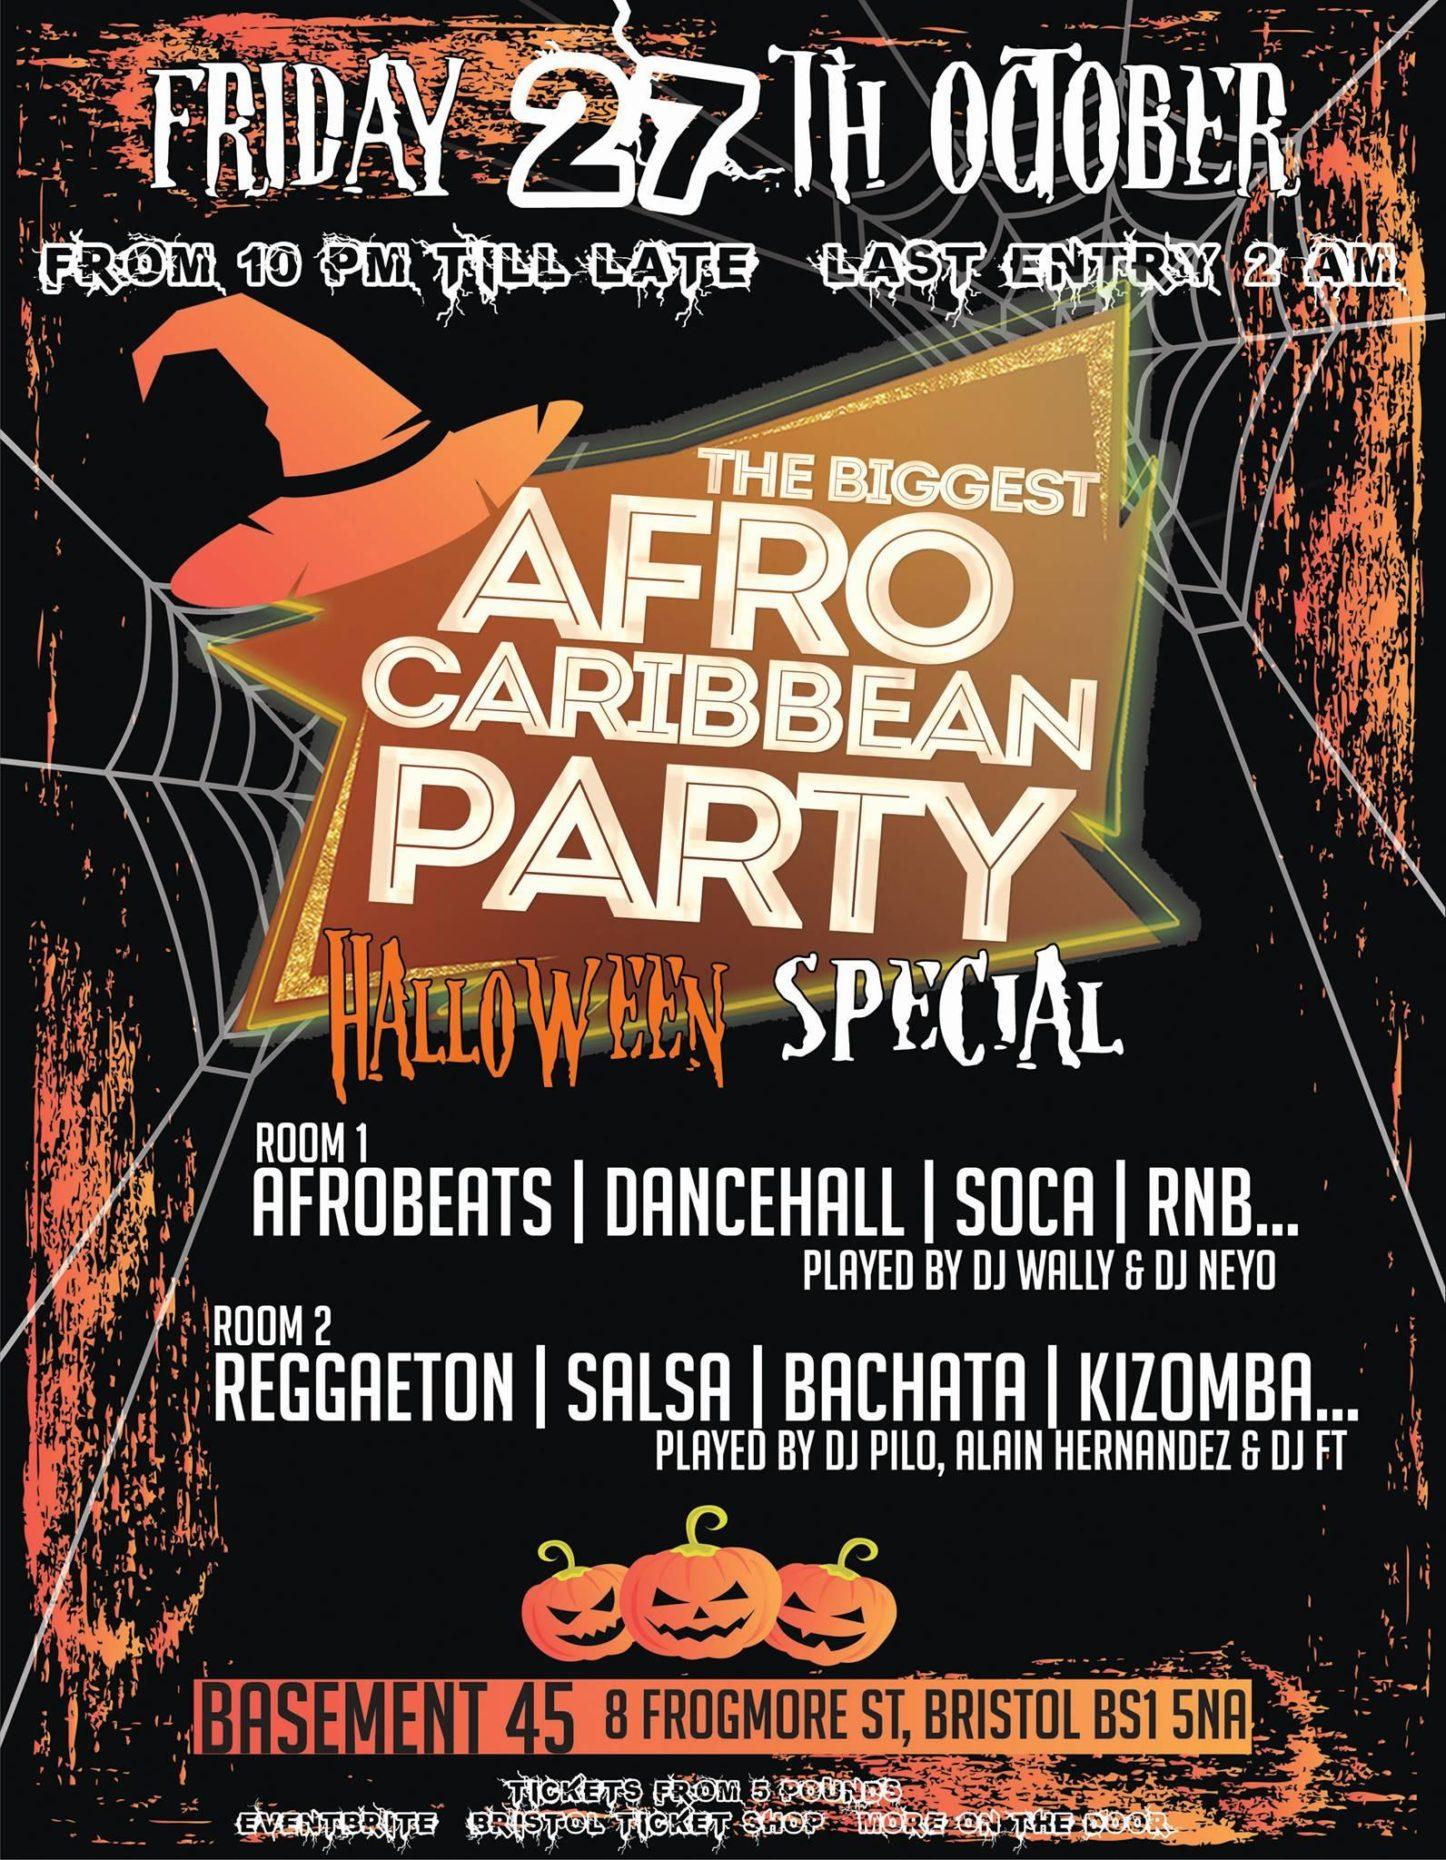 THE BIGGEST AFRO CARIBBEAN PARTY HALLOWEEN SPECIAL | Blacknet UK